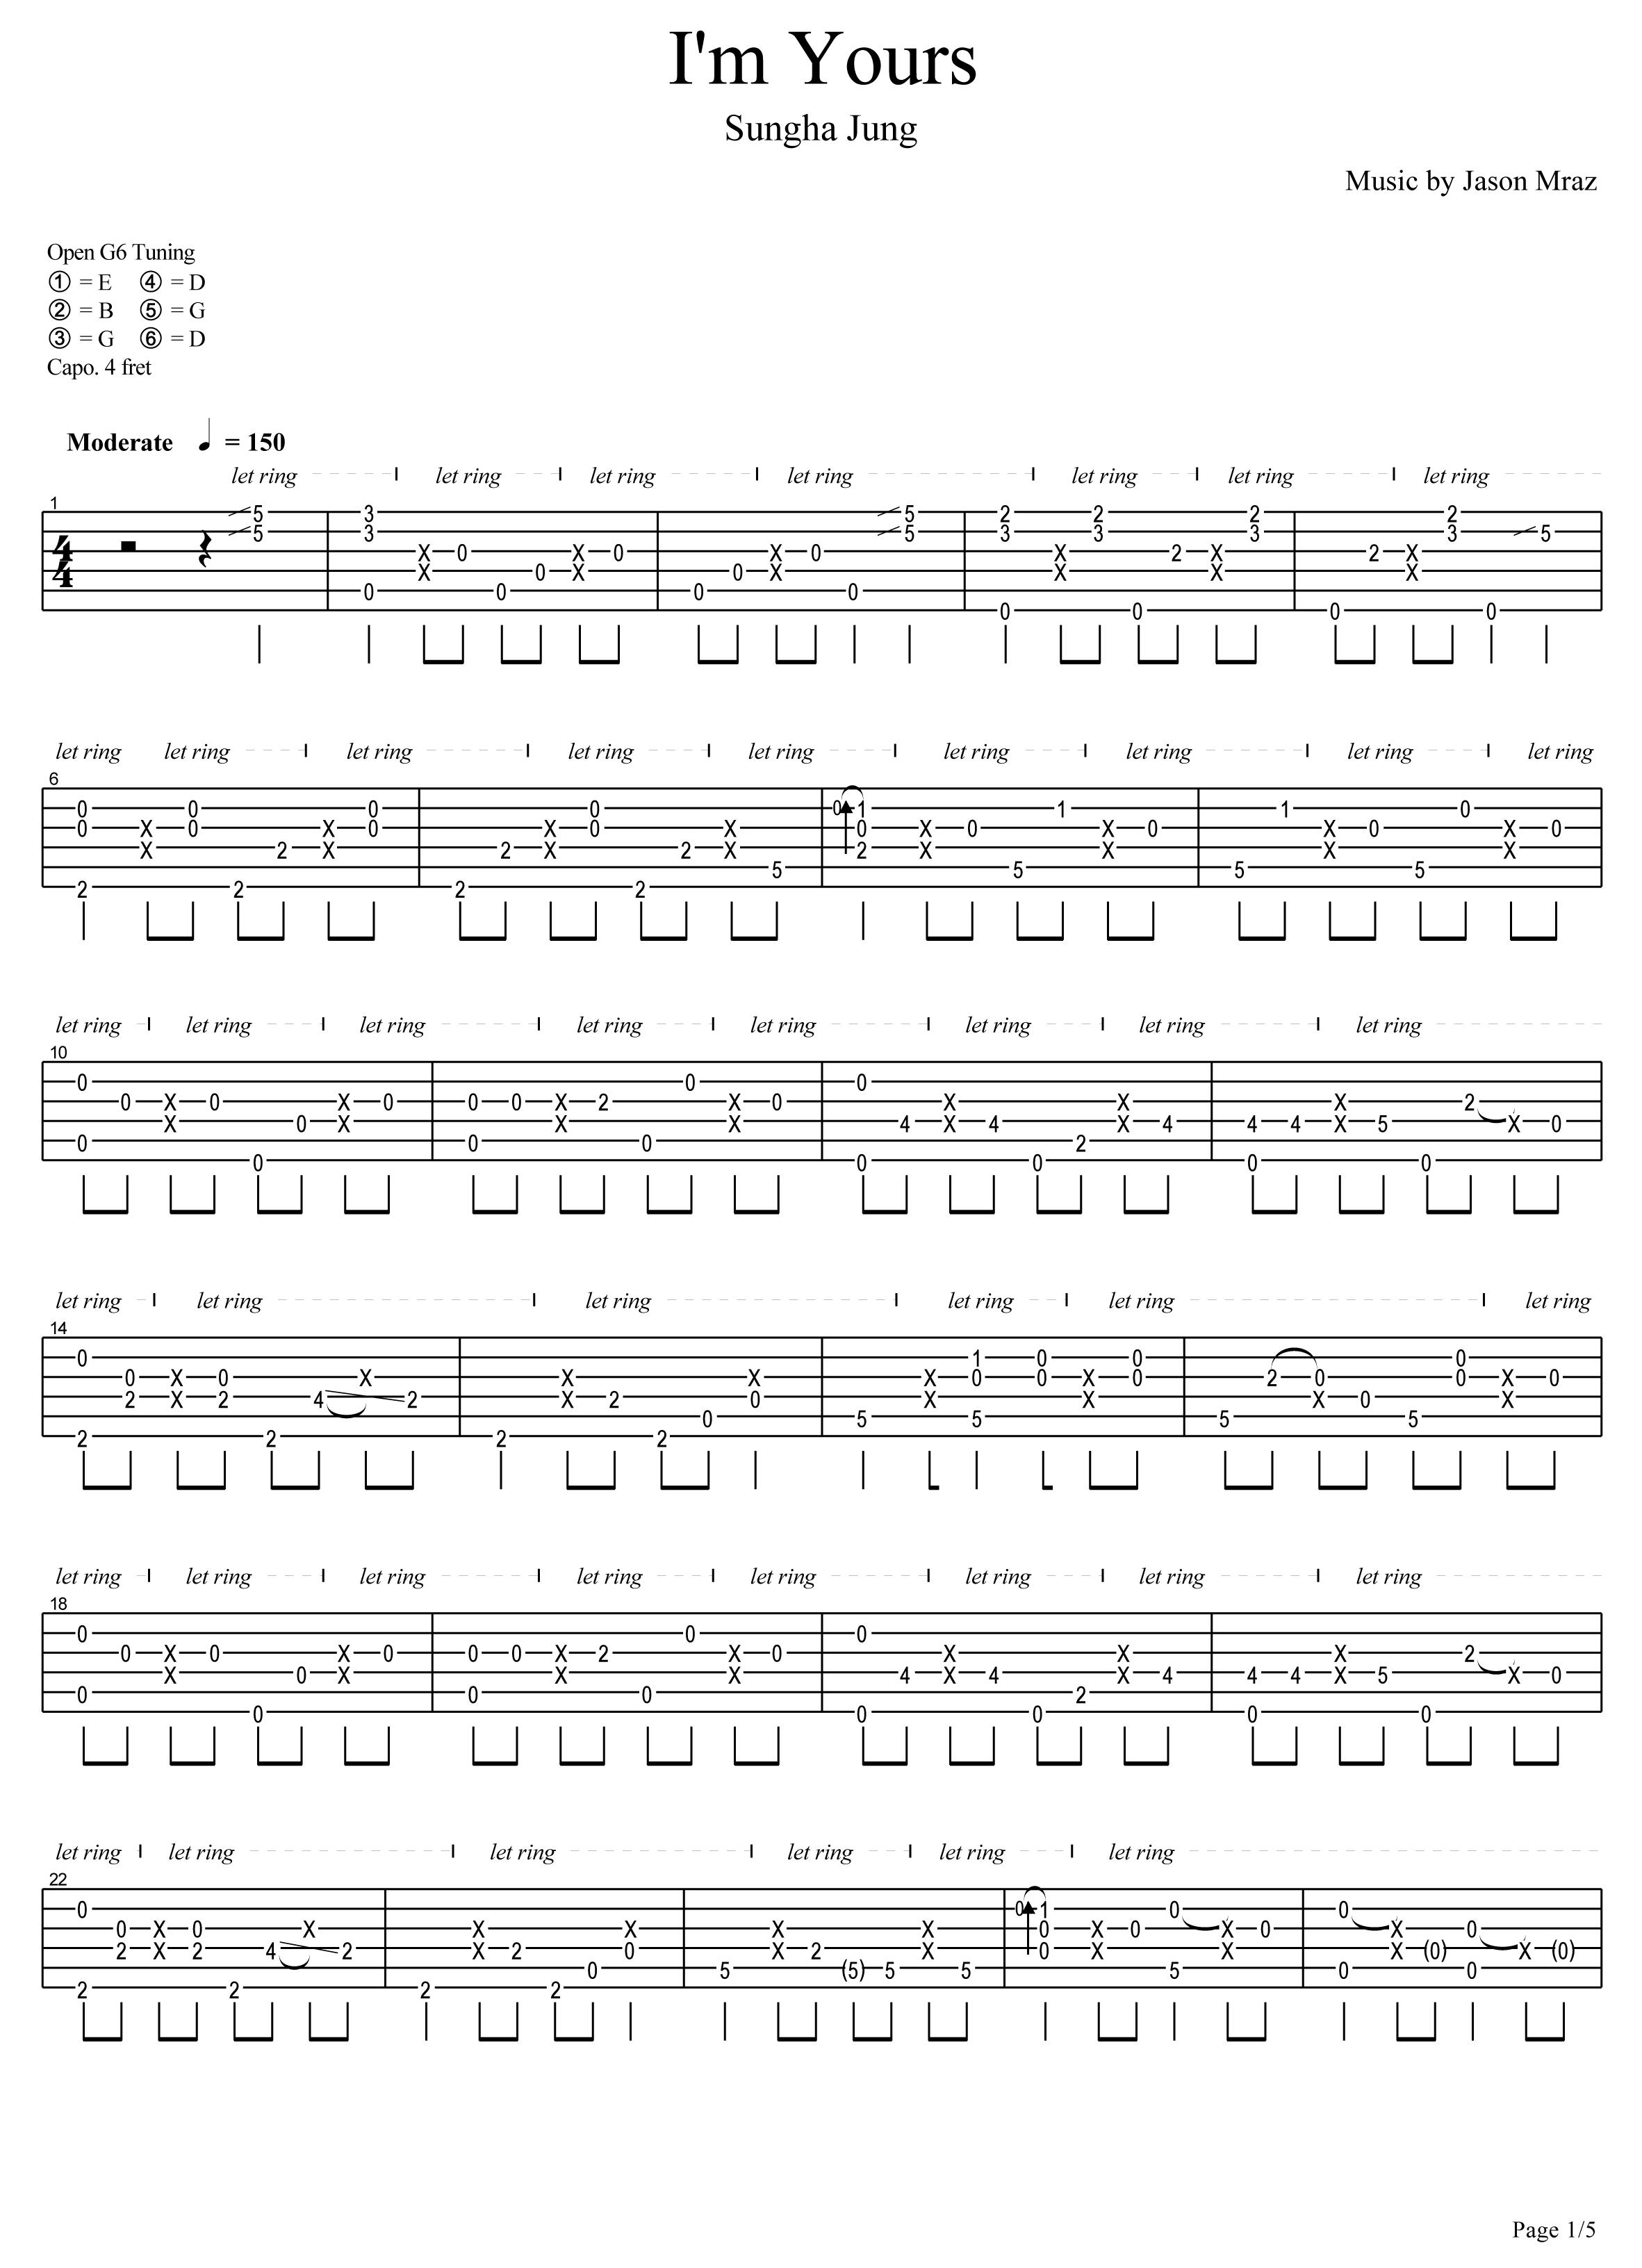 00:00/00:00 gtp格式吉他谱下载:  图片(img)格式吉他谱: im_yours